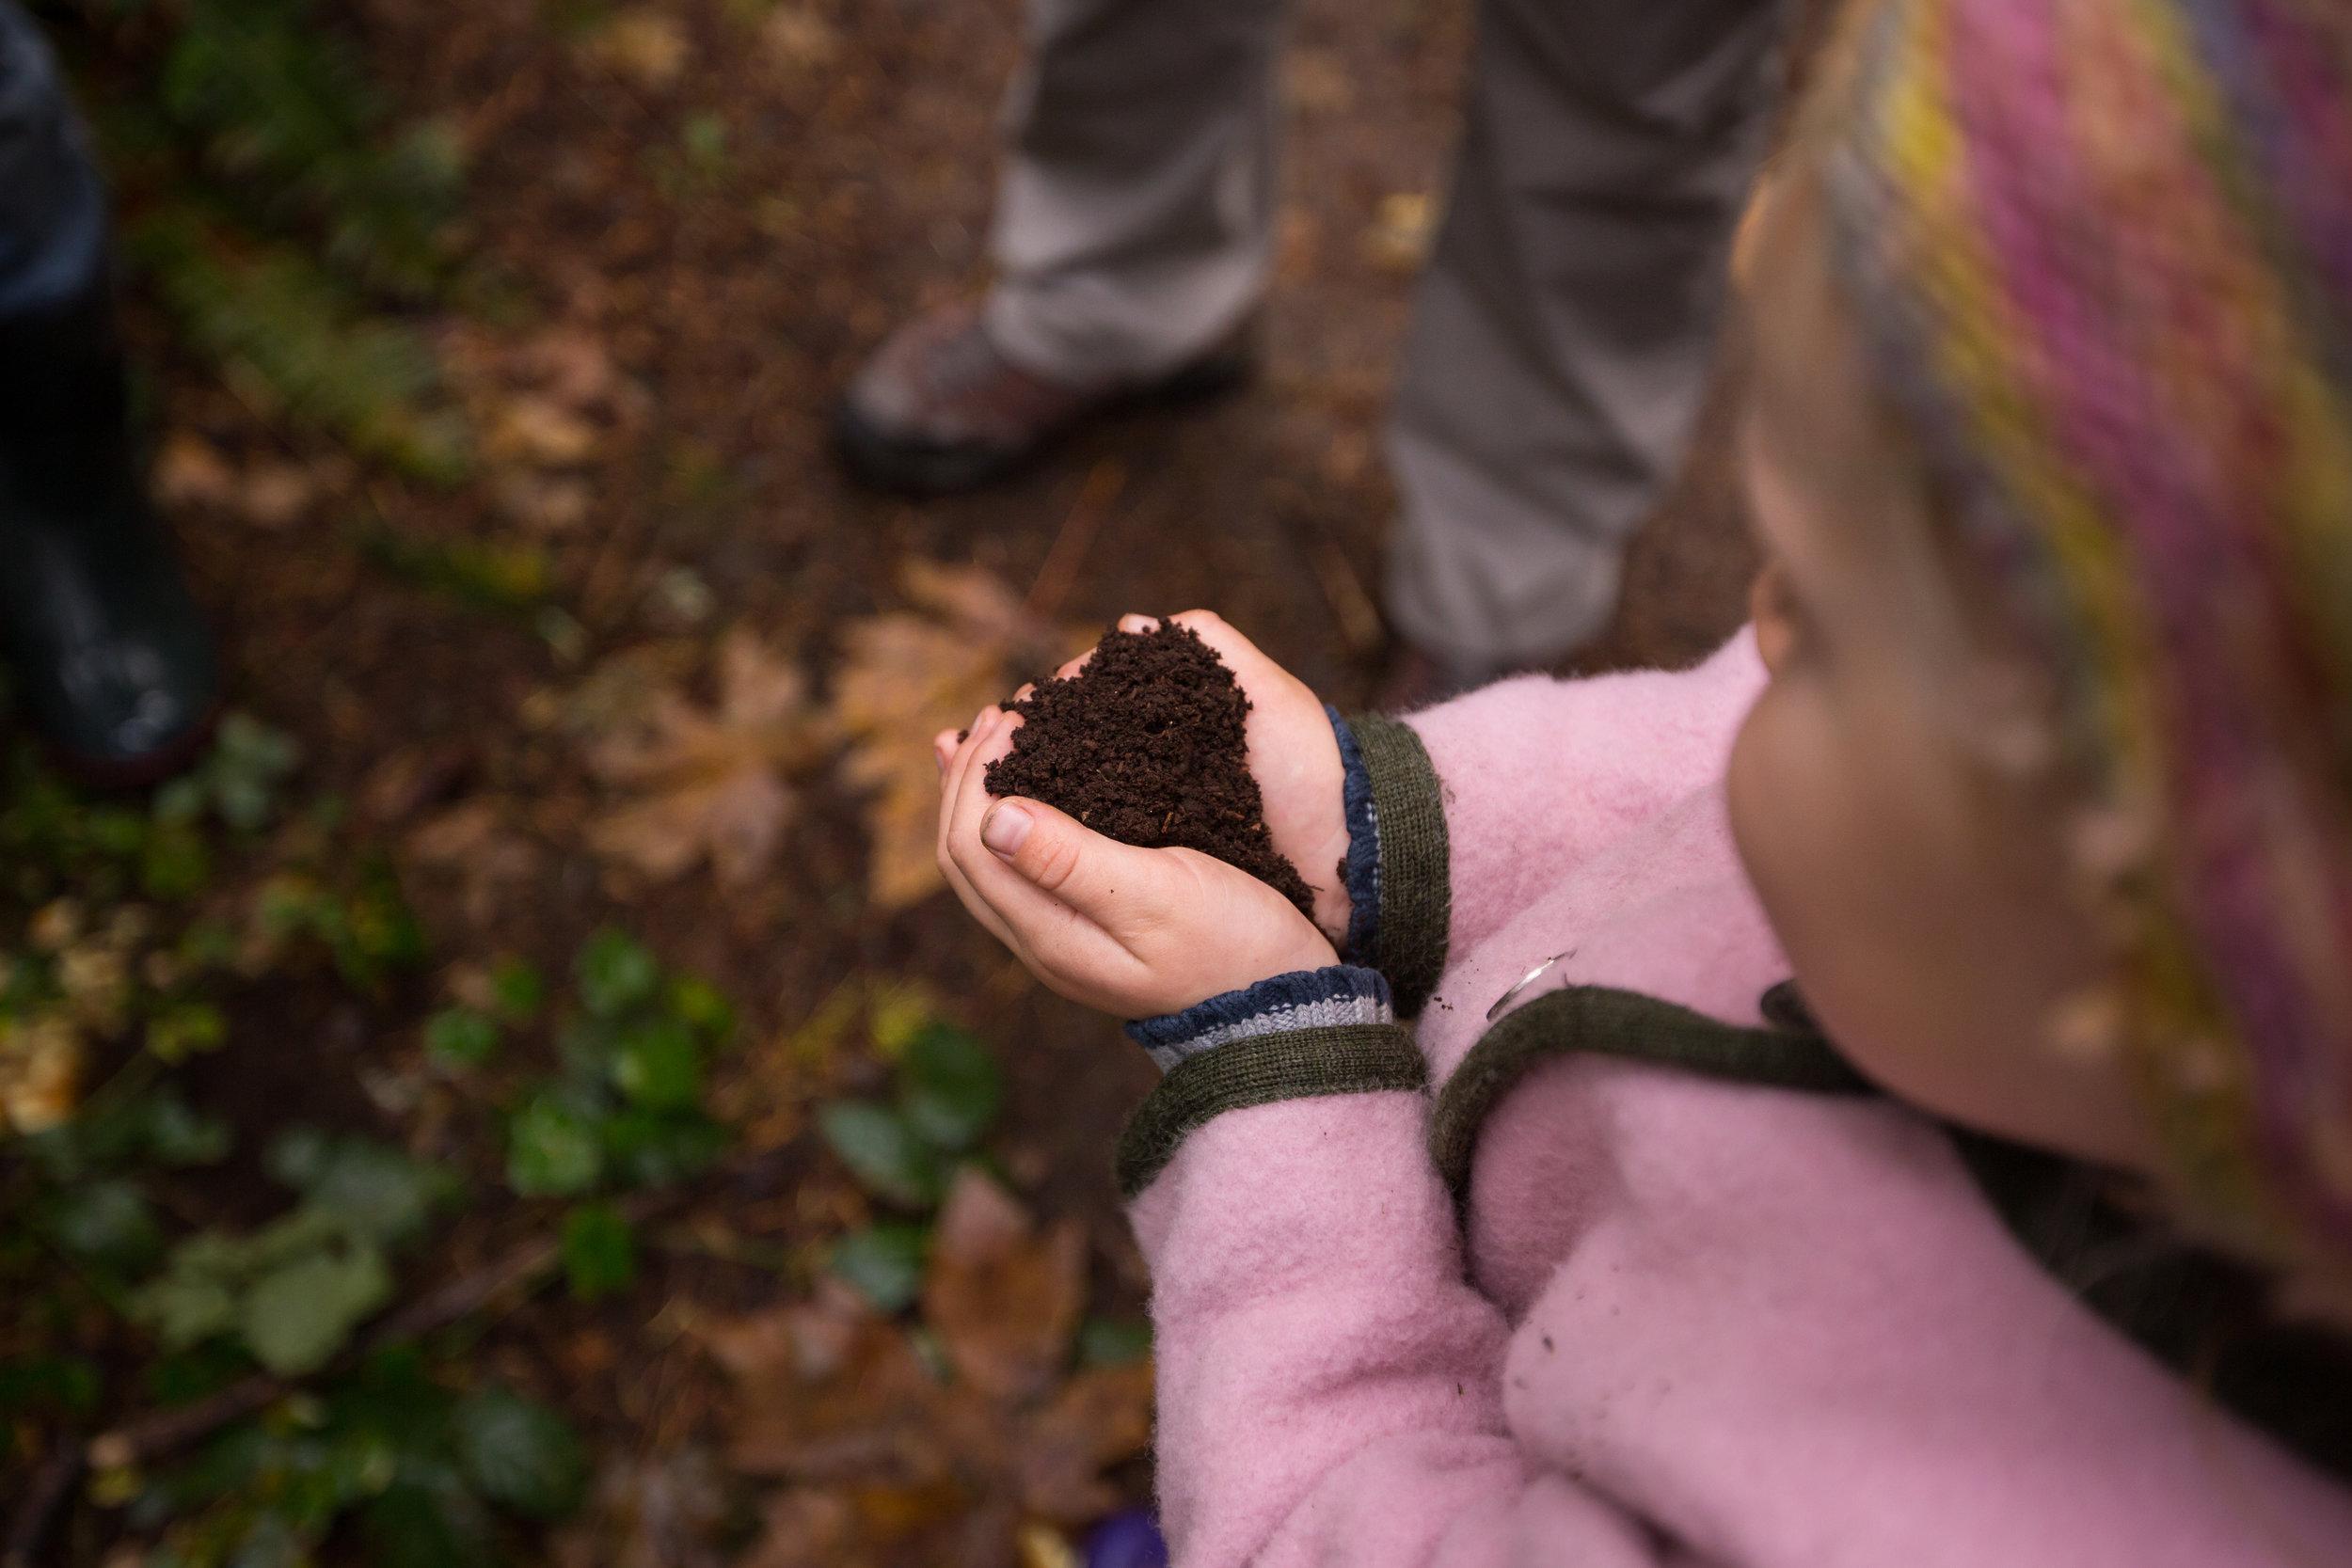 girl holding handful of dirt in shape of heart